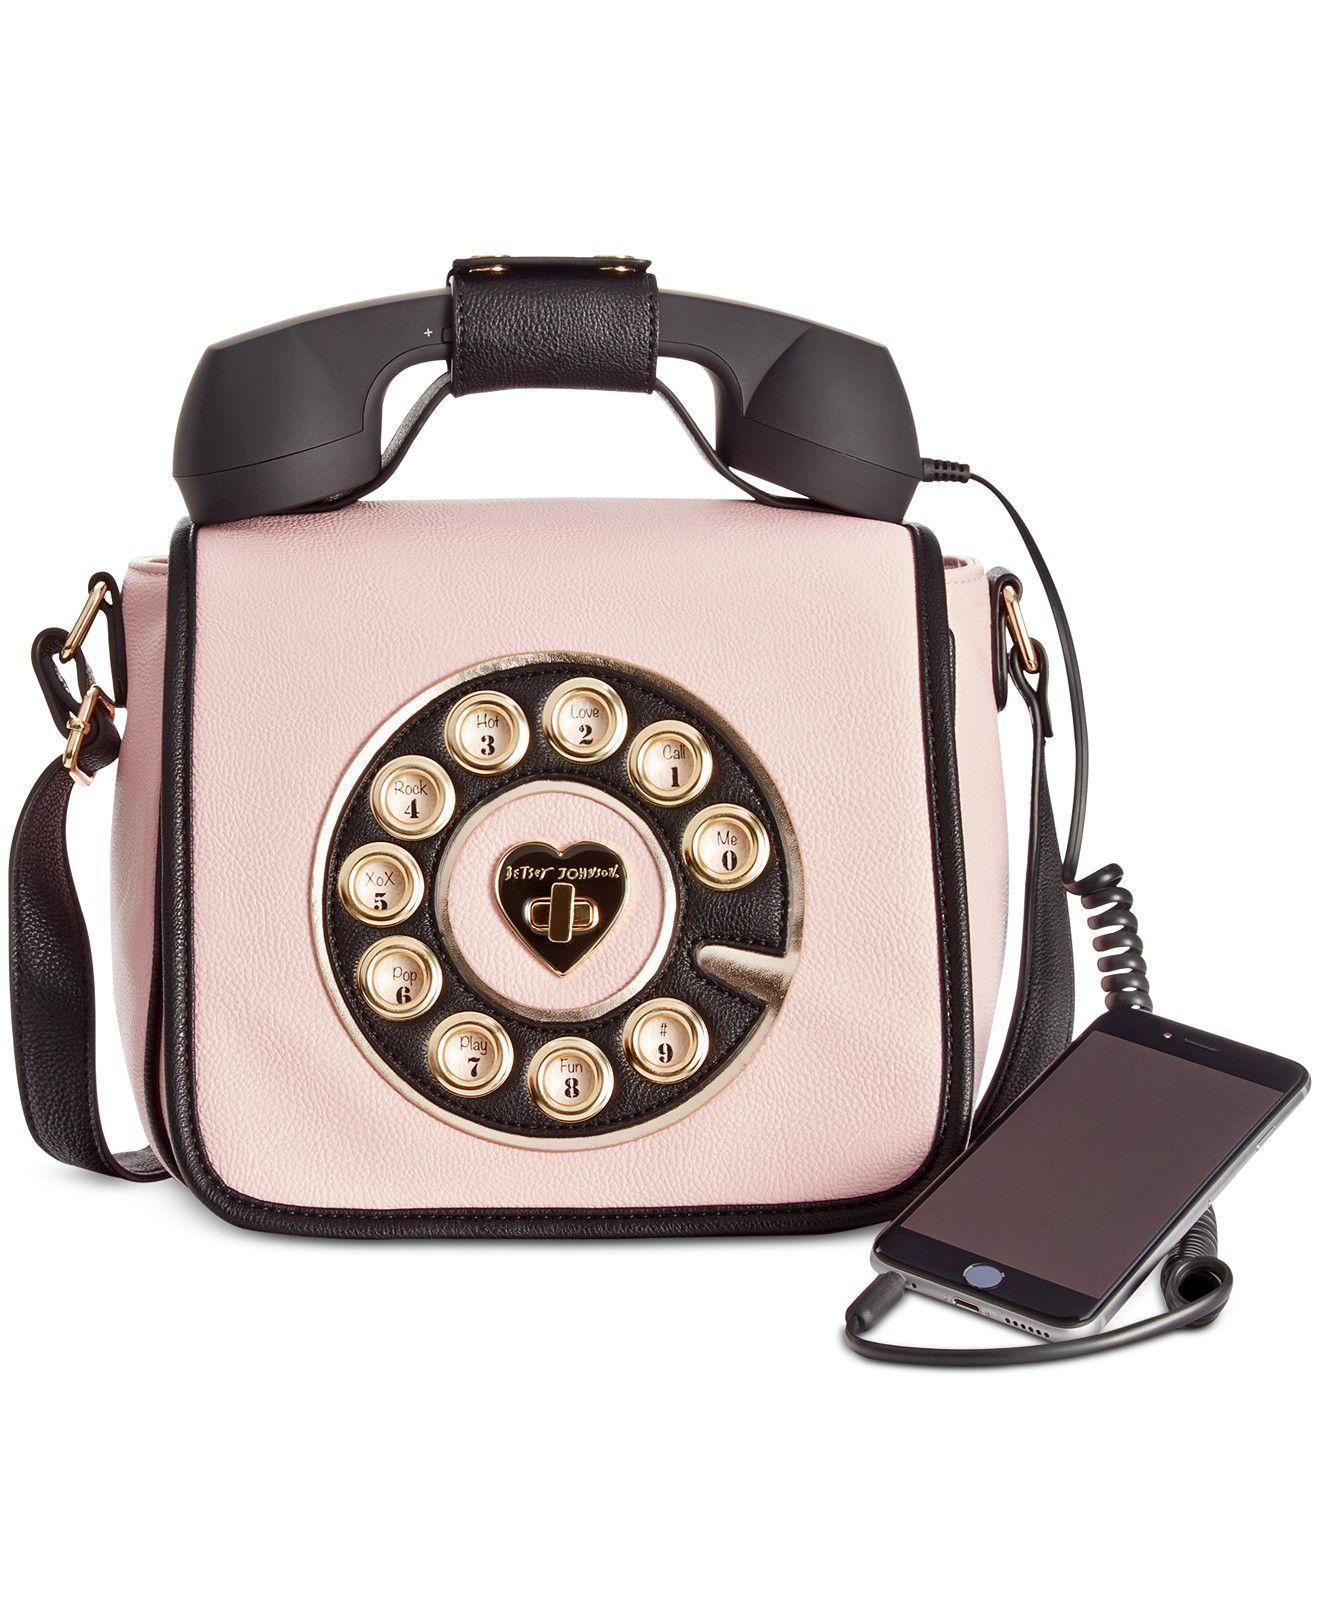 e5a1ec3c80 Betsey Johnson Phone Crossbody - All Handbags - Handbags   Accessories -  Macy s